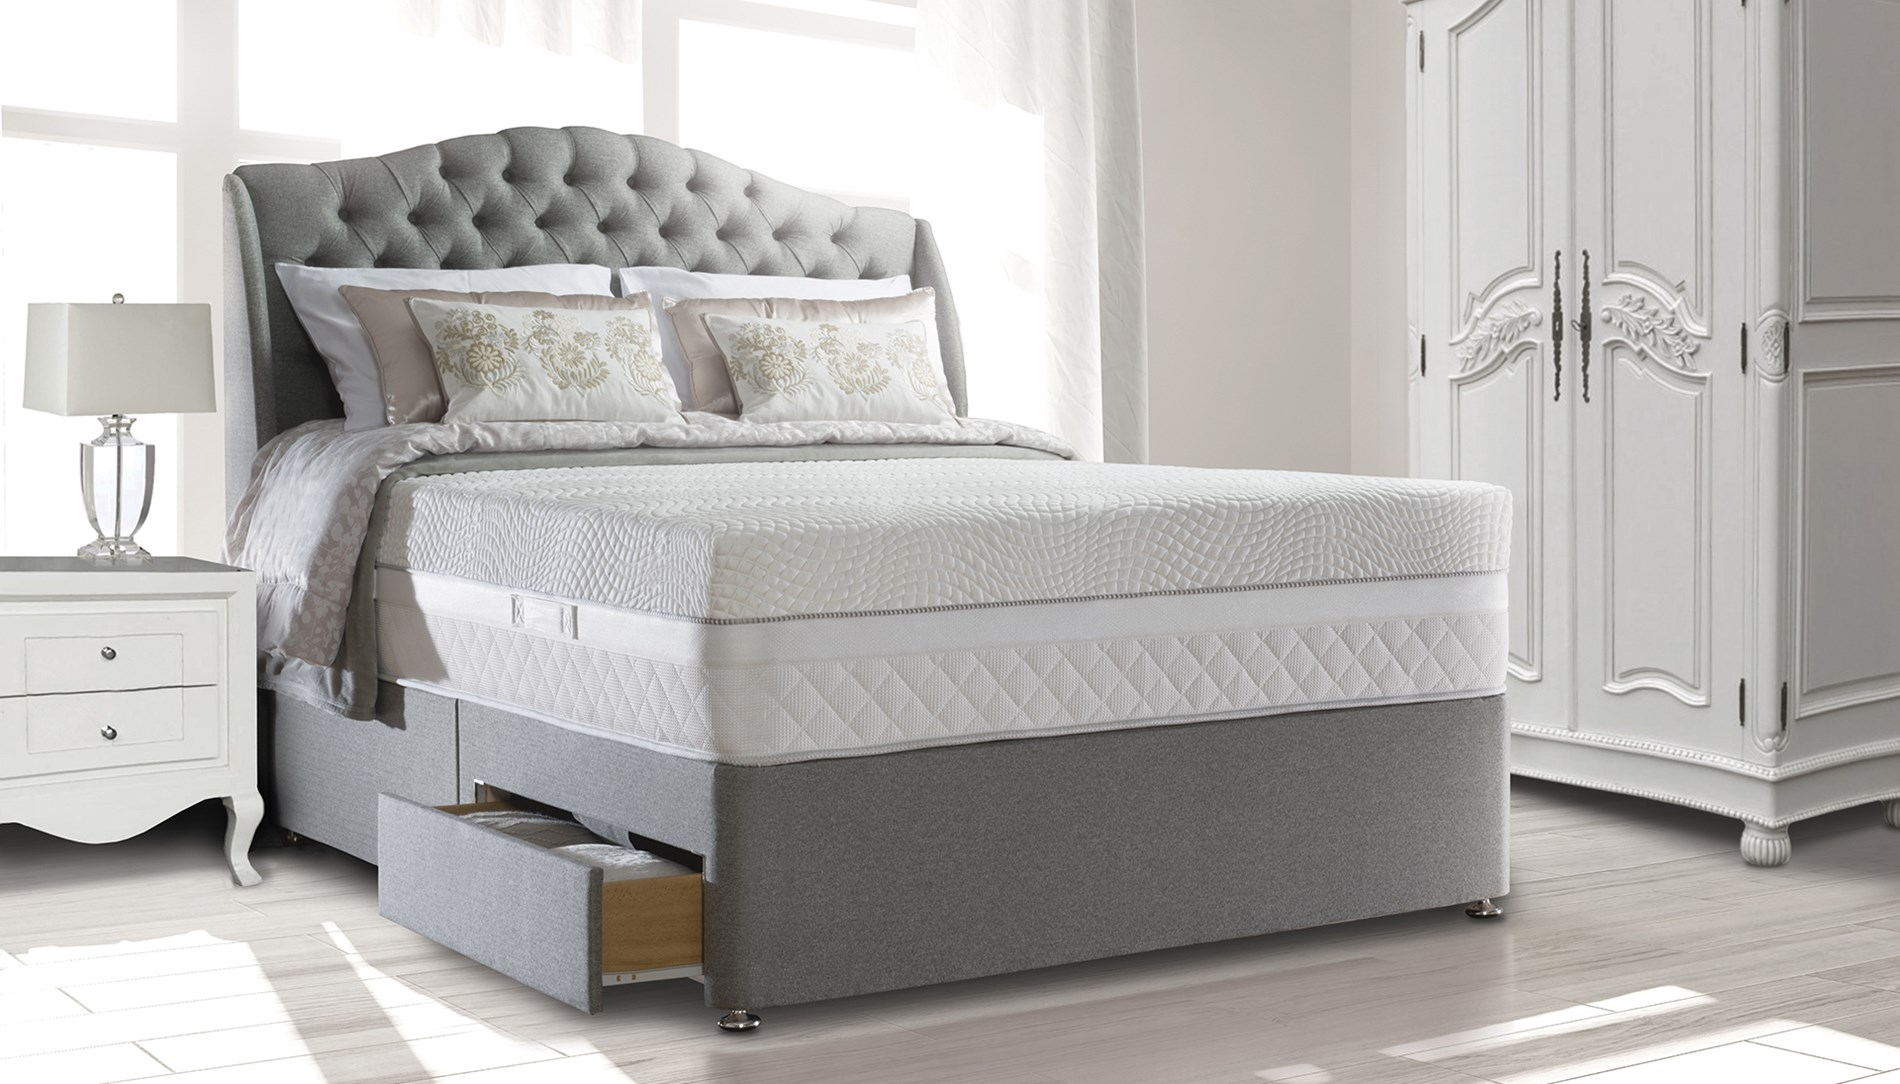 mattresses sealy hybrid regency 3600 mattress. Black Bedroom Furniture Sets. Home Design Ideas